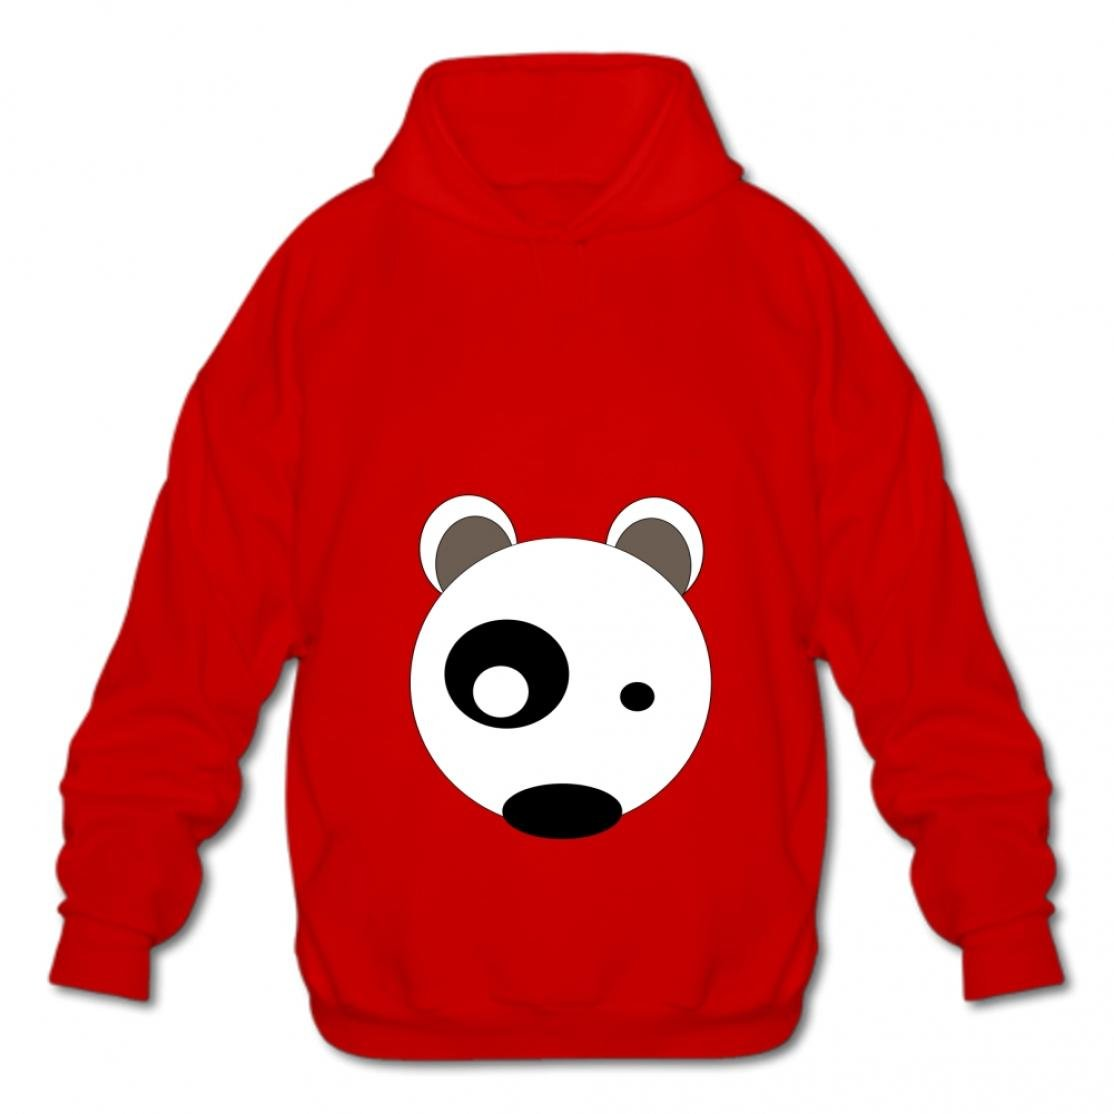 Tngjijish Men Fashion Sweatshirt Cotton Pullover Hooded Fashion Hoodies-03 Cartoon Dog Dsdy